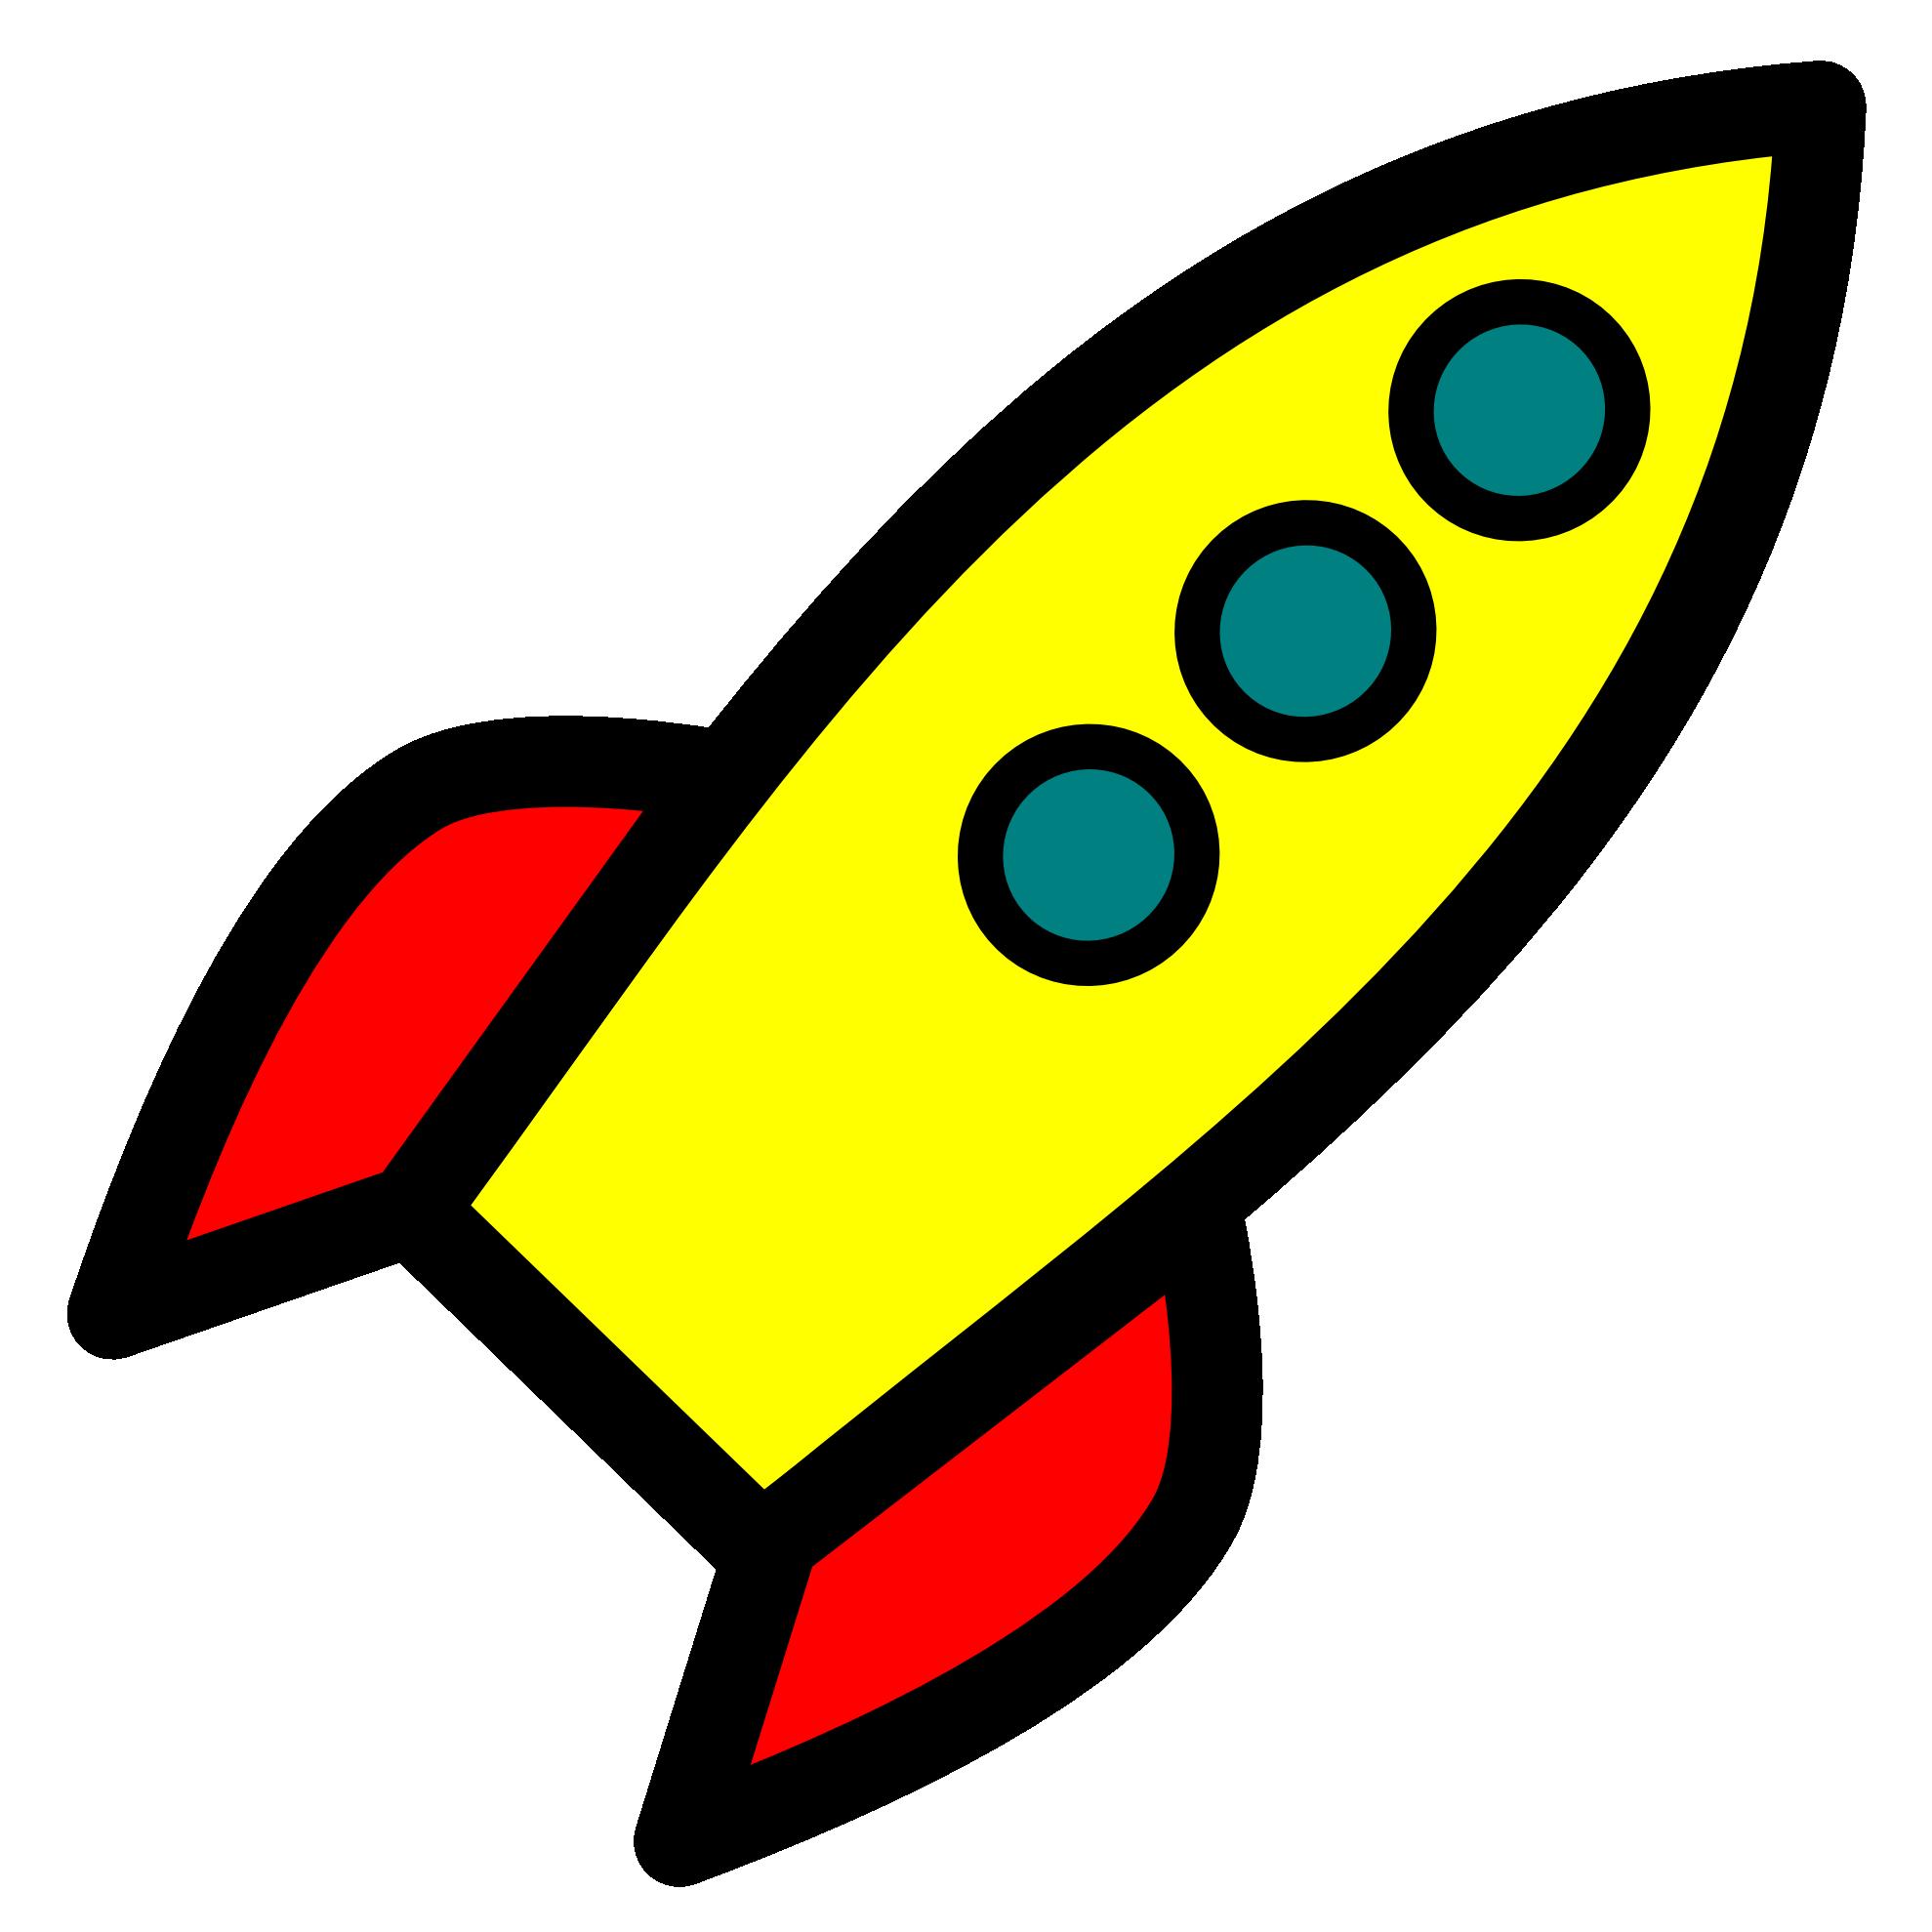 Rocket Clipart - ClipArt Best